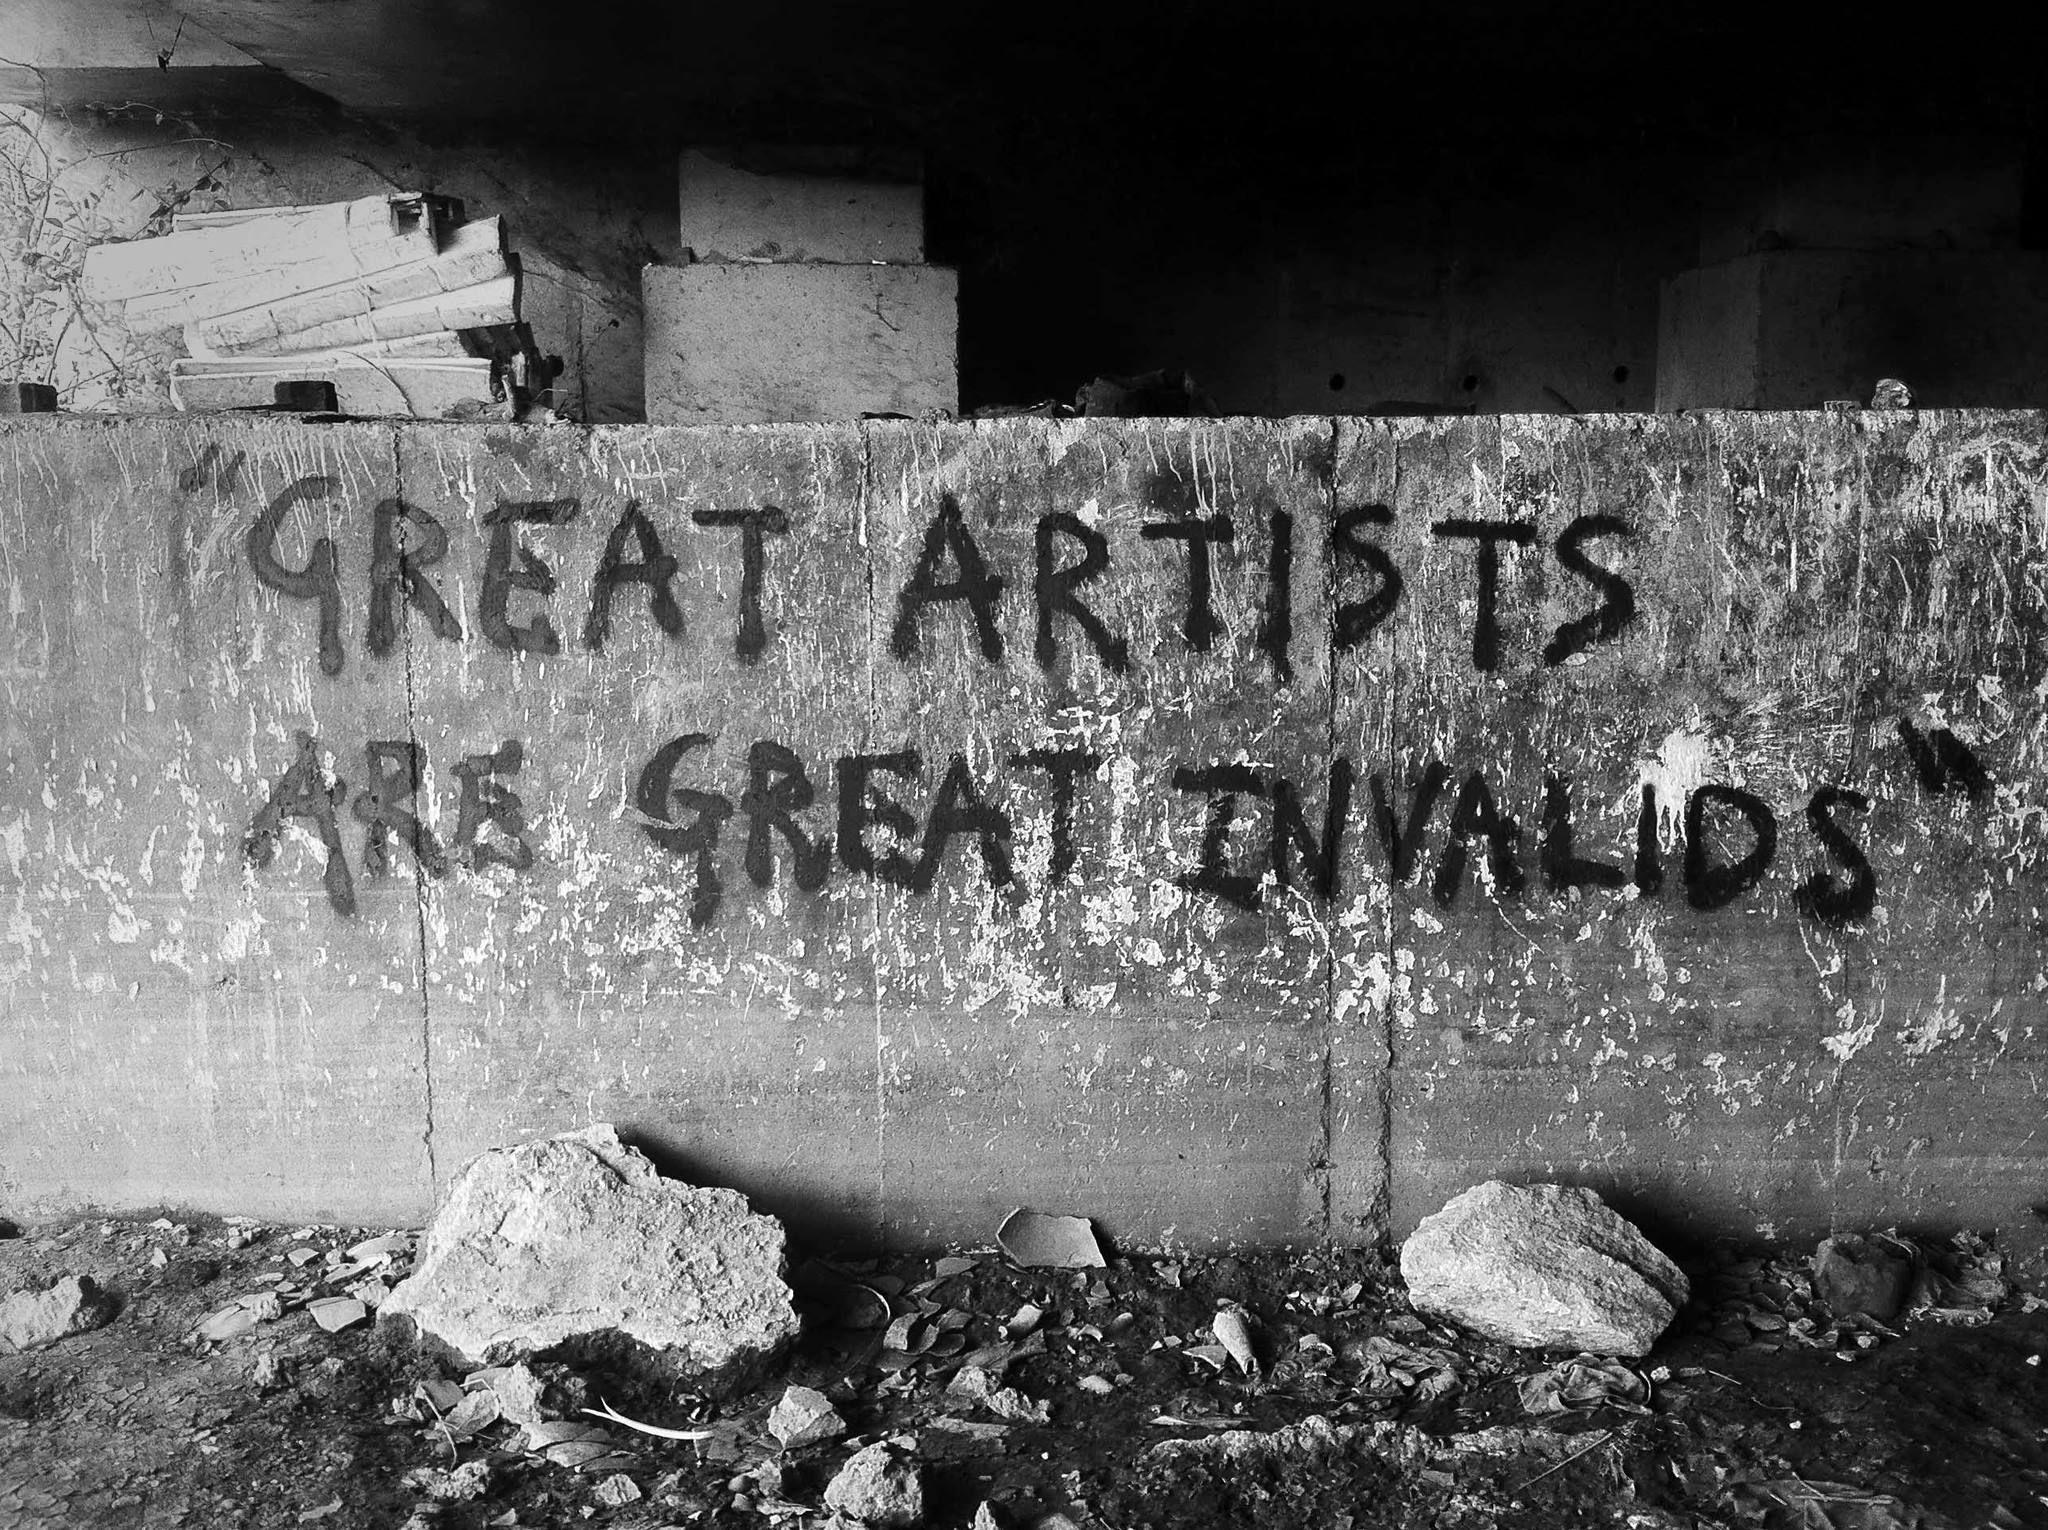 Pin by alexandra nikoleta agisilaou on graffiti is art or vandalism